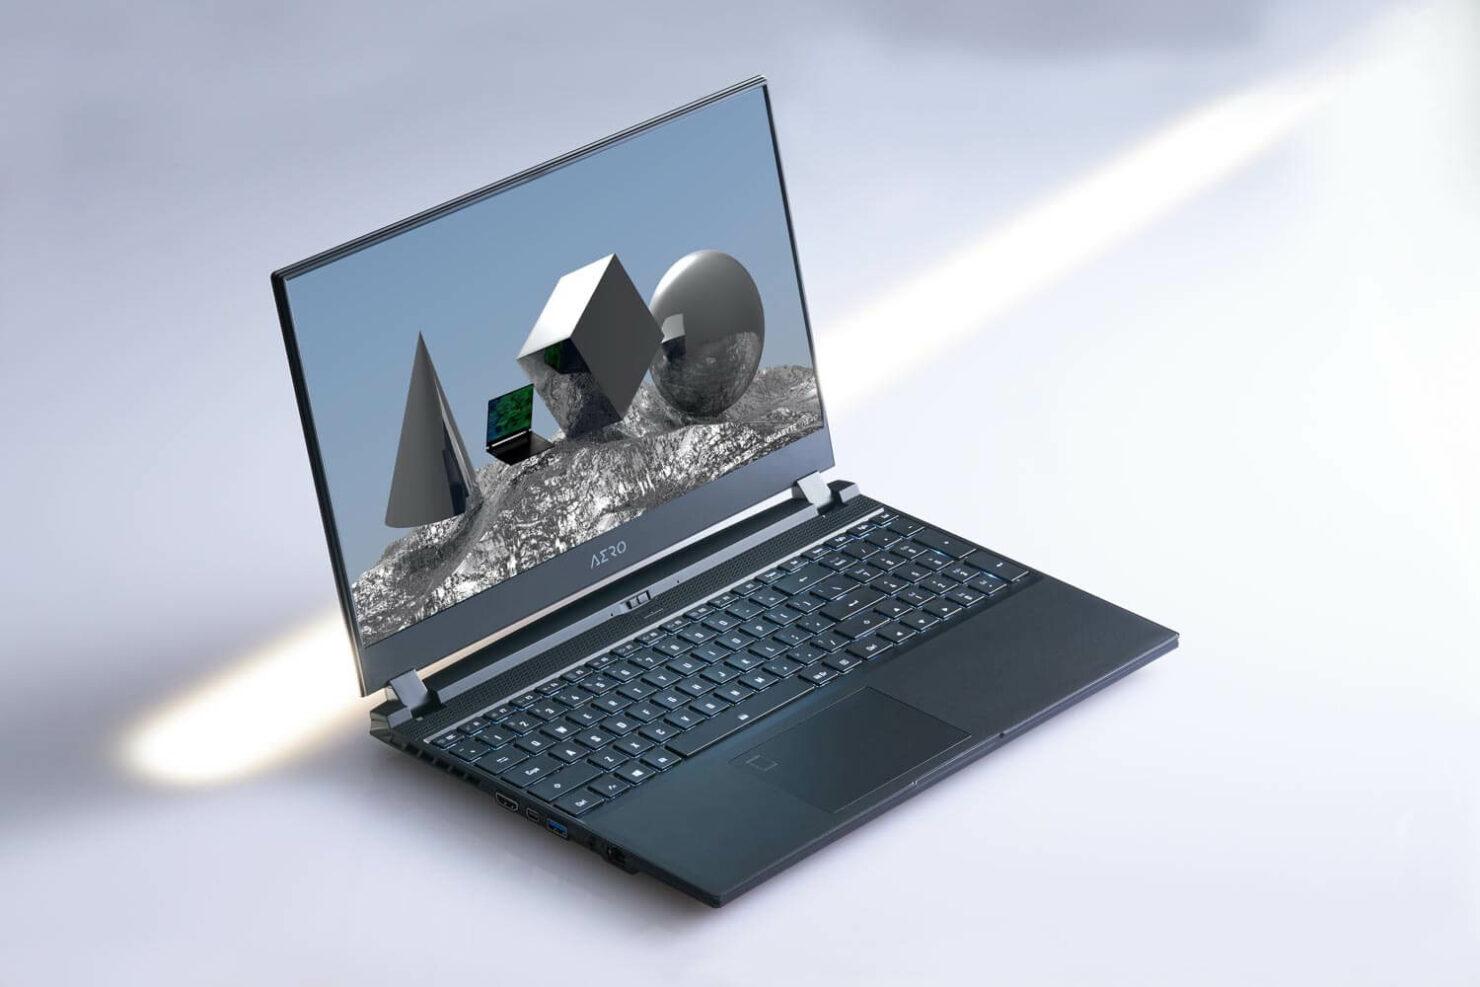 aero-intel-11th-gen-laptop-1